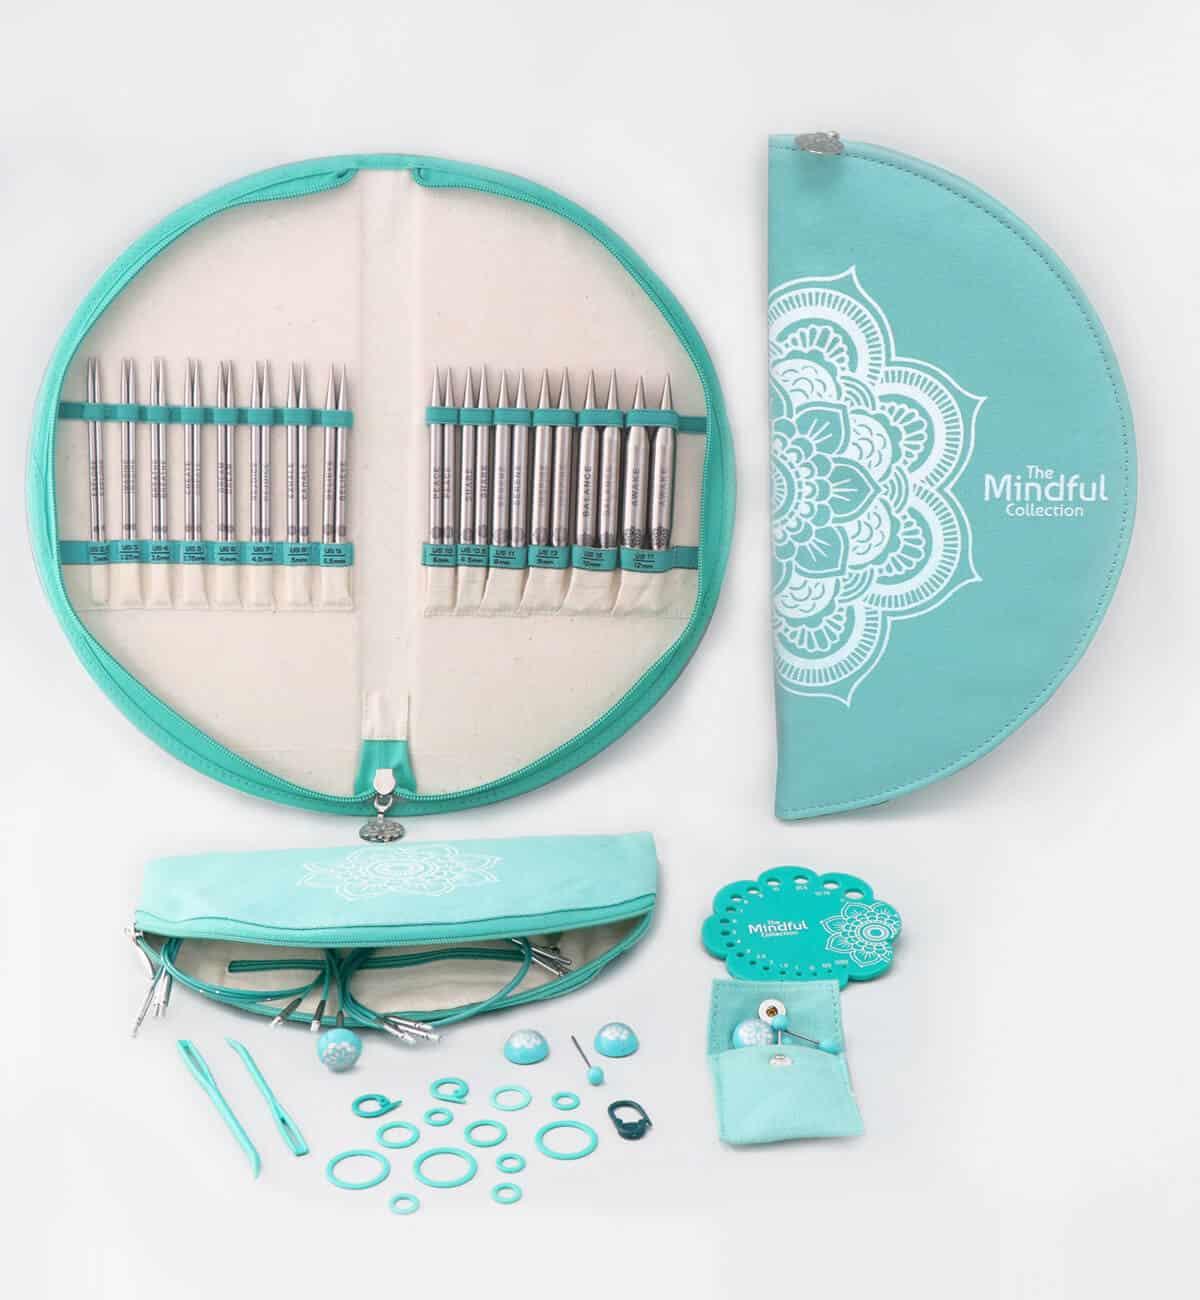 Interchangeable Needle Set Mindful Collection